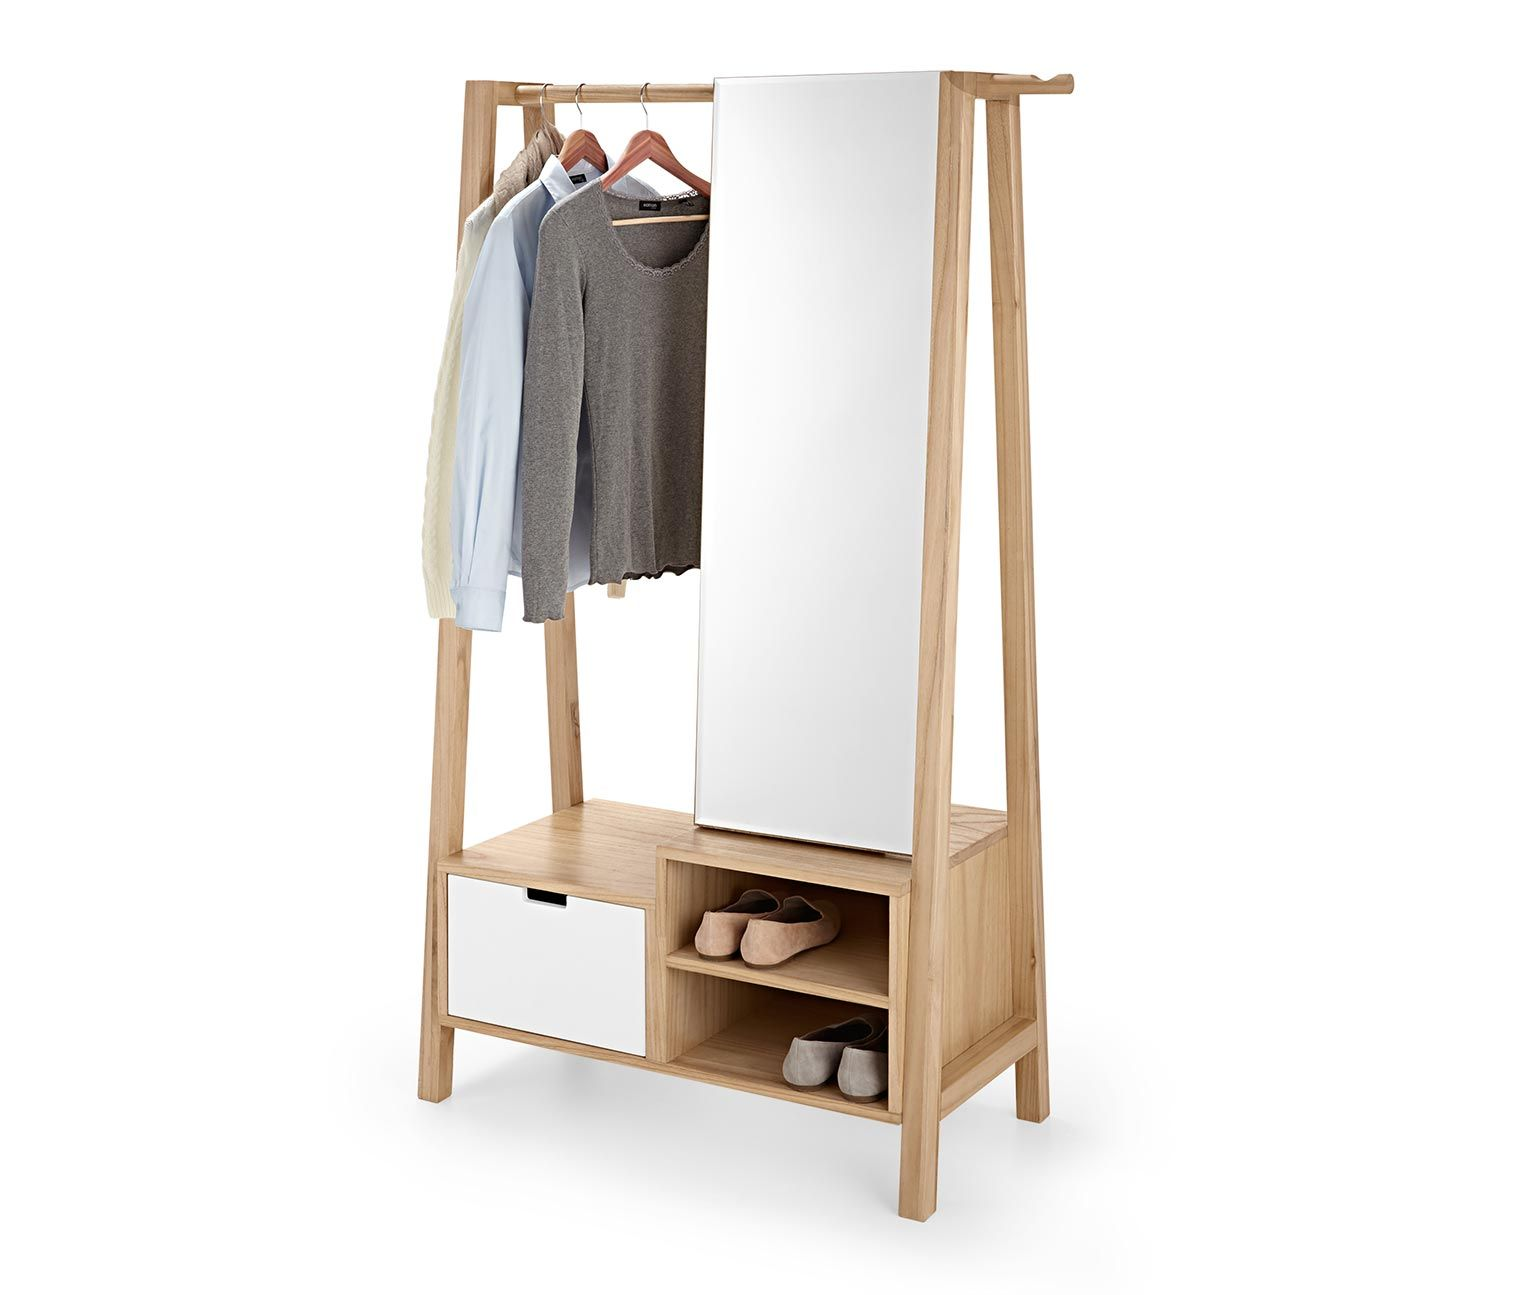 aynal elbise ask s 329415 for the home pinterest schlafzimmer. Black Bedroom Furniture Sets. Home Design Ideas